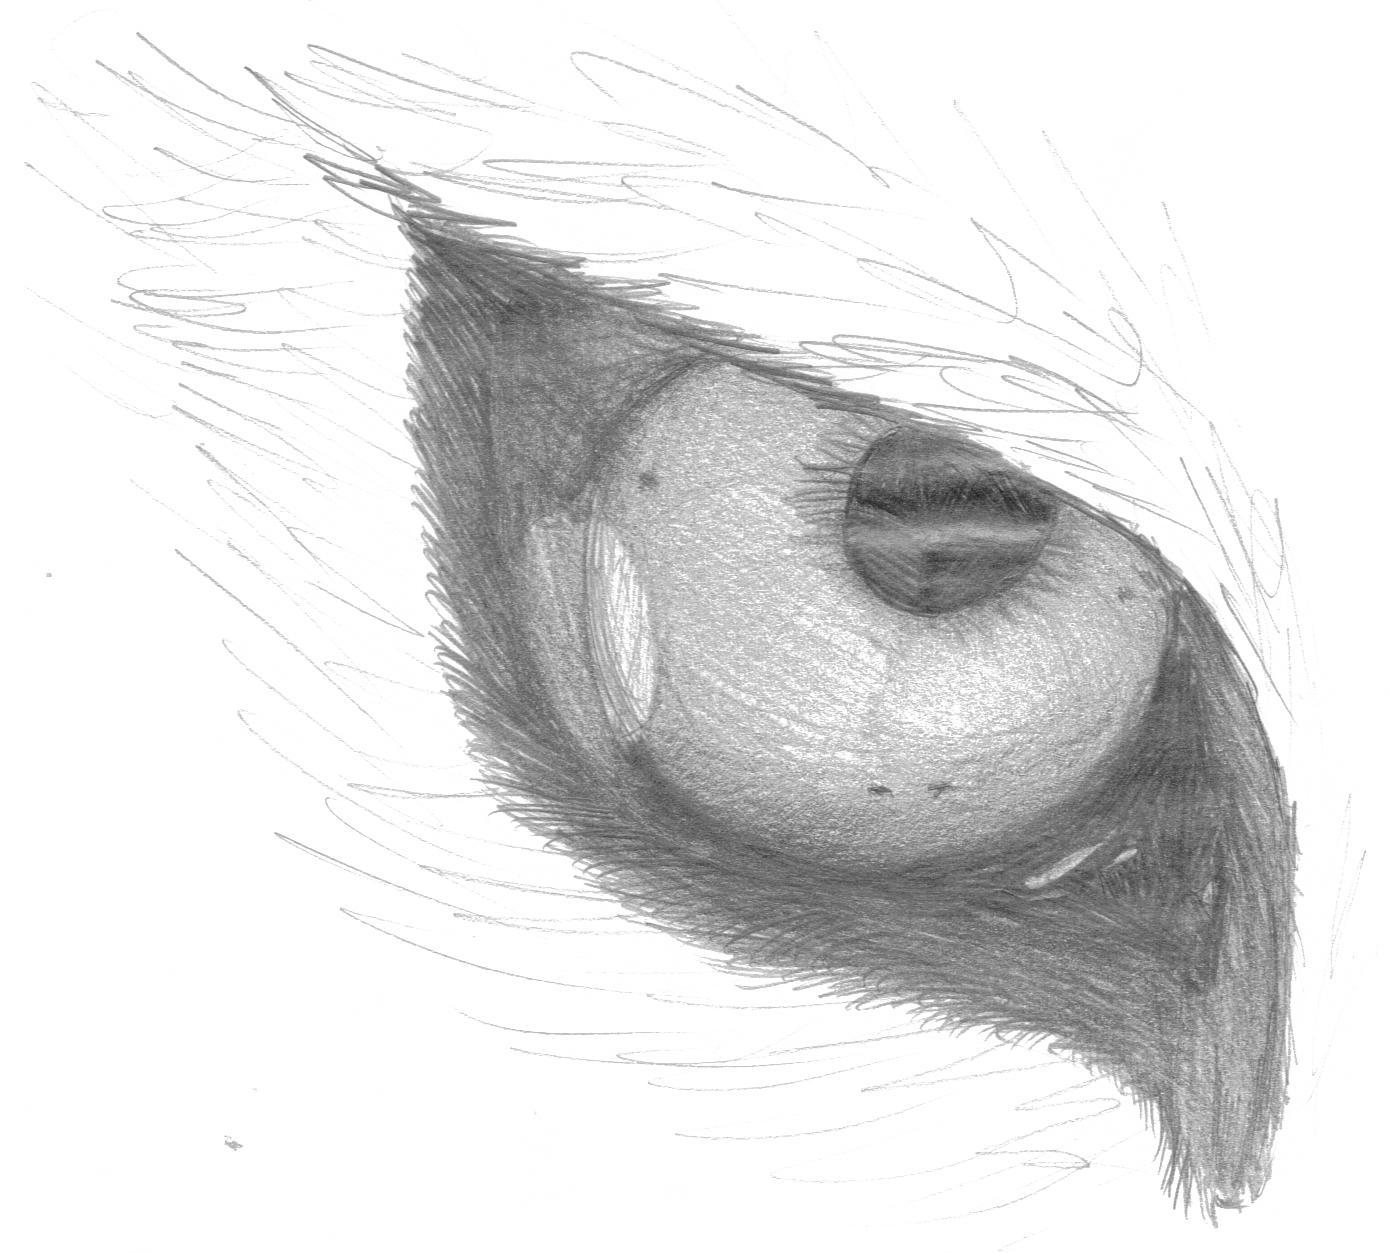 zeichnung eye of the tiger xdd pok mon fanart. Black Bedroom Furniture Sets. Home Design Ideas